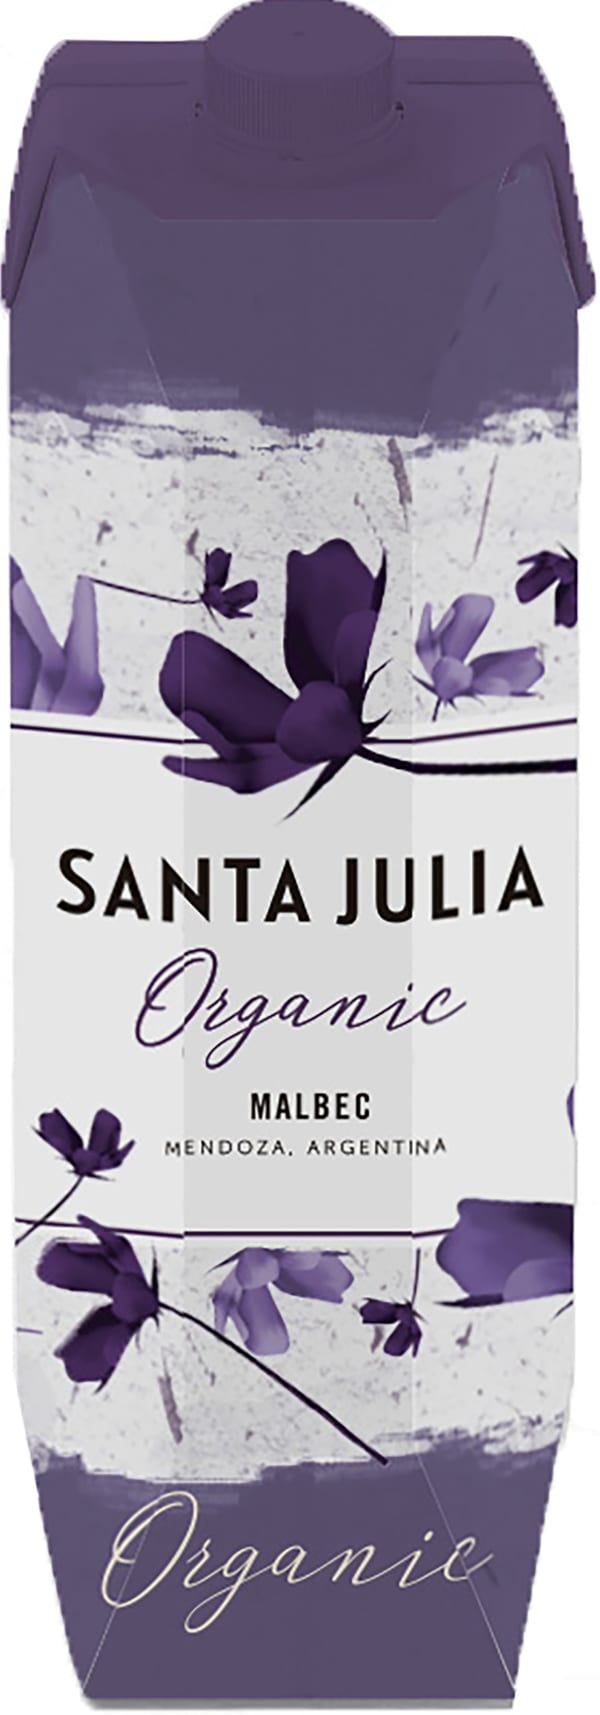 Santa Julia Organic Malbec 2016 carton package